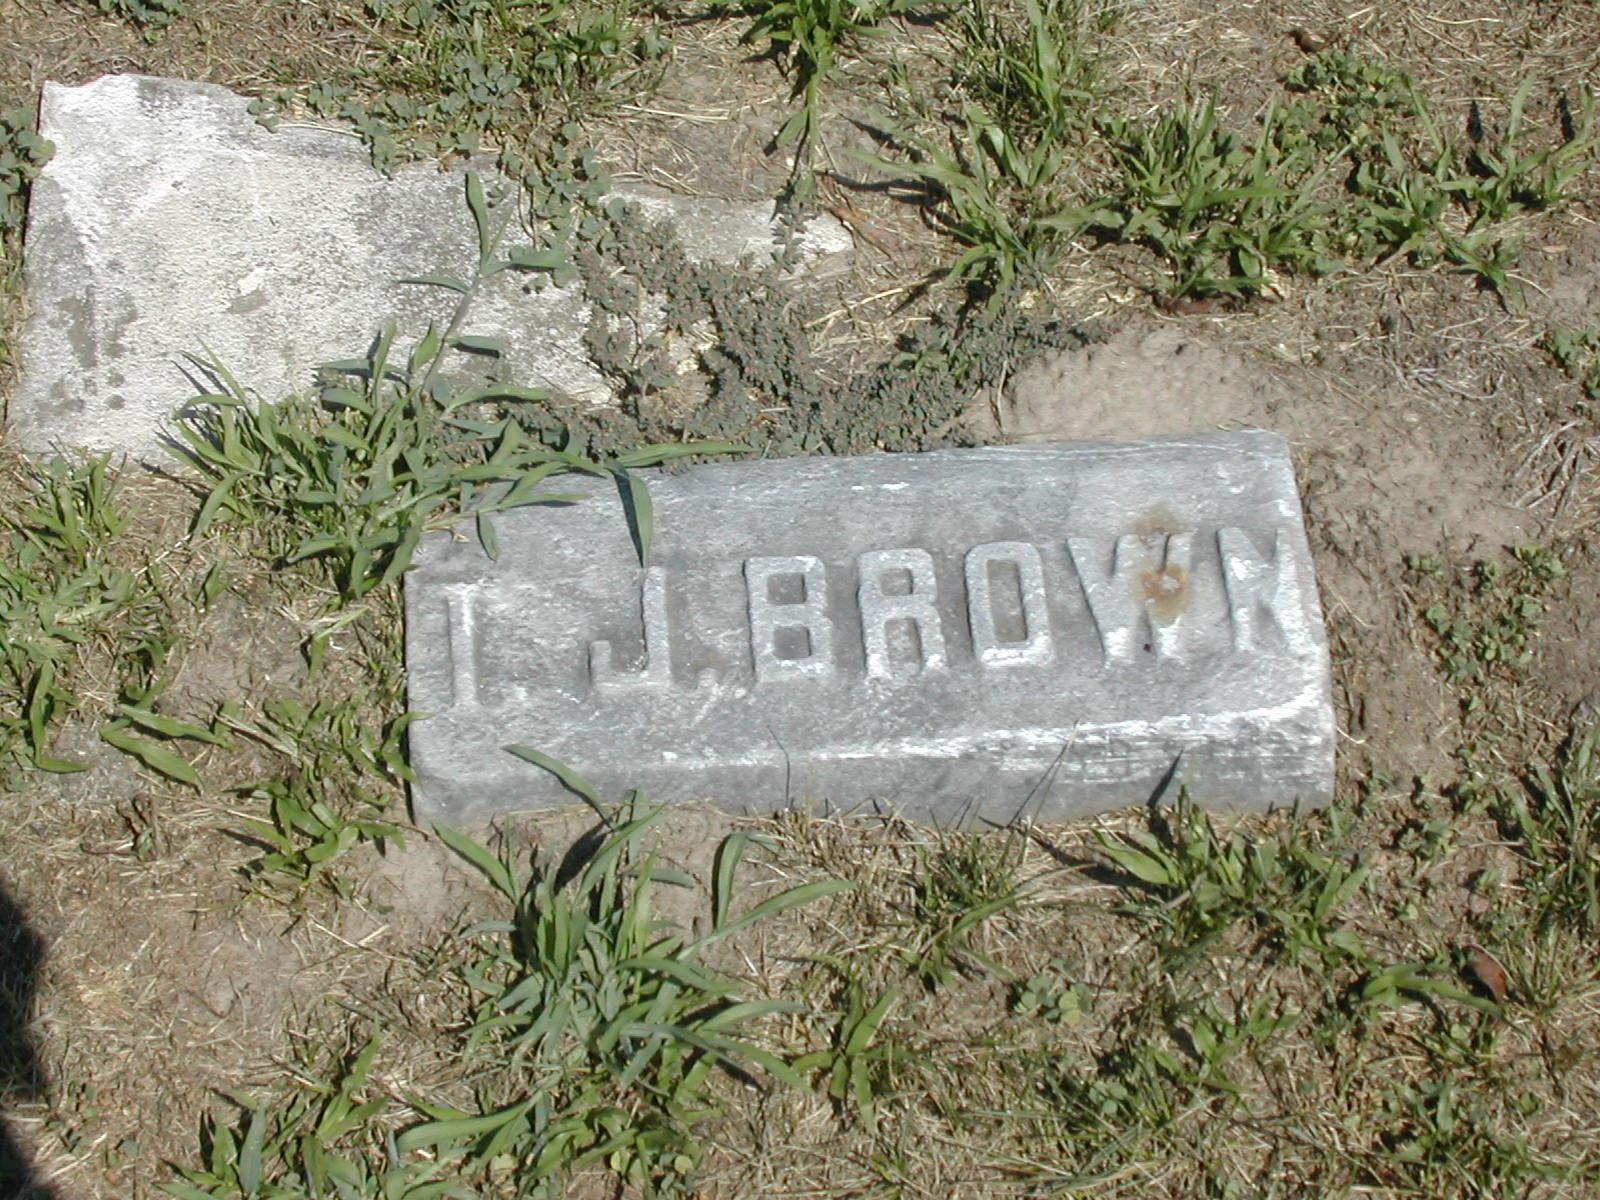 Matthew C. Brown